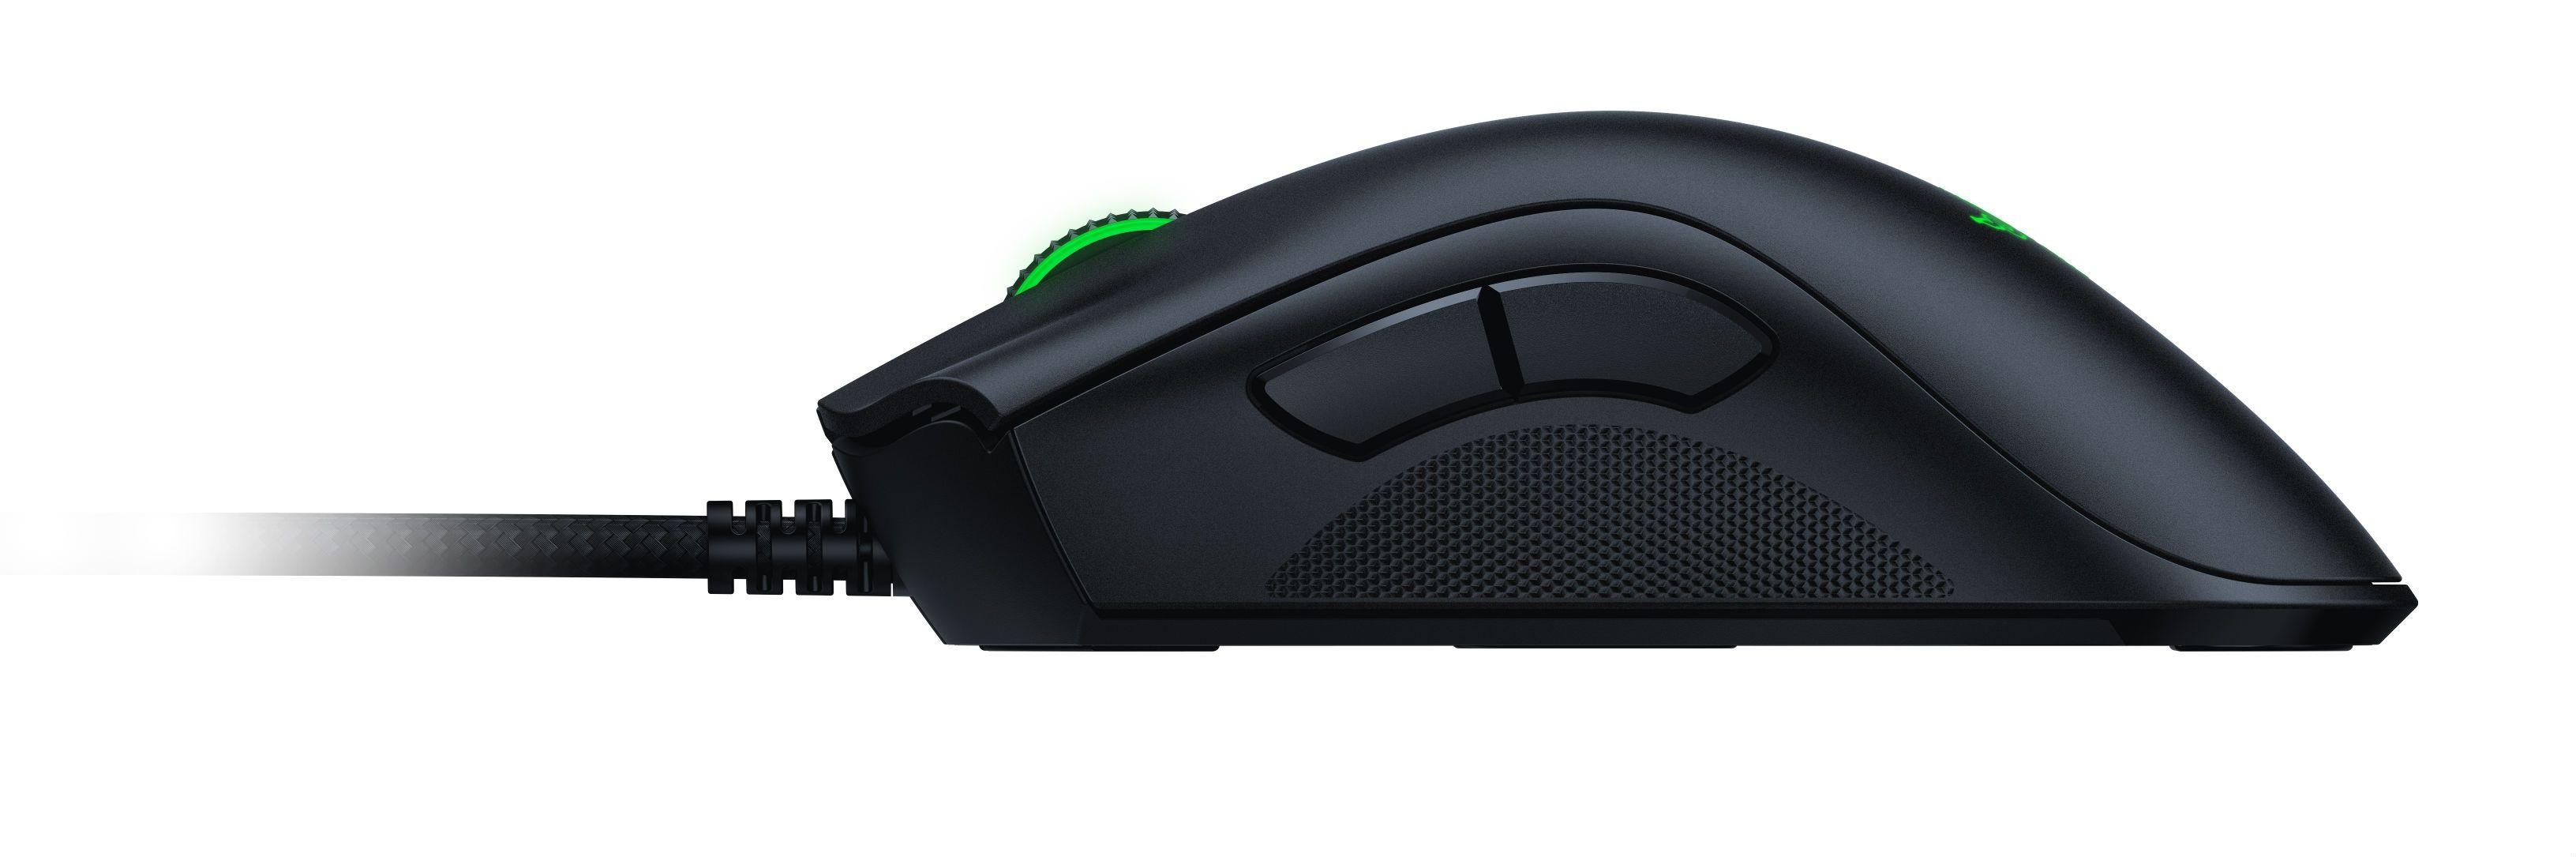 Гейминг мишка Razer - DeathAdder V2, черна - 4